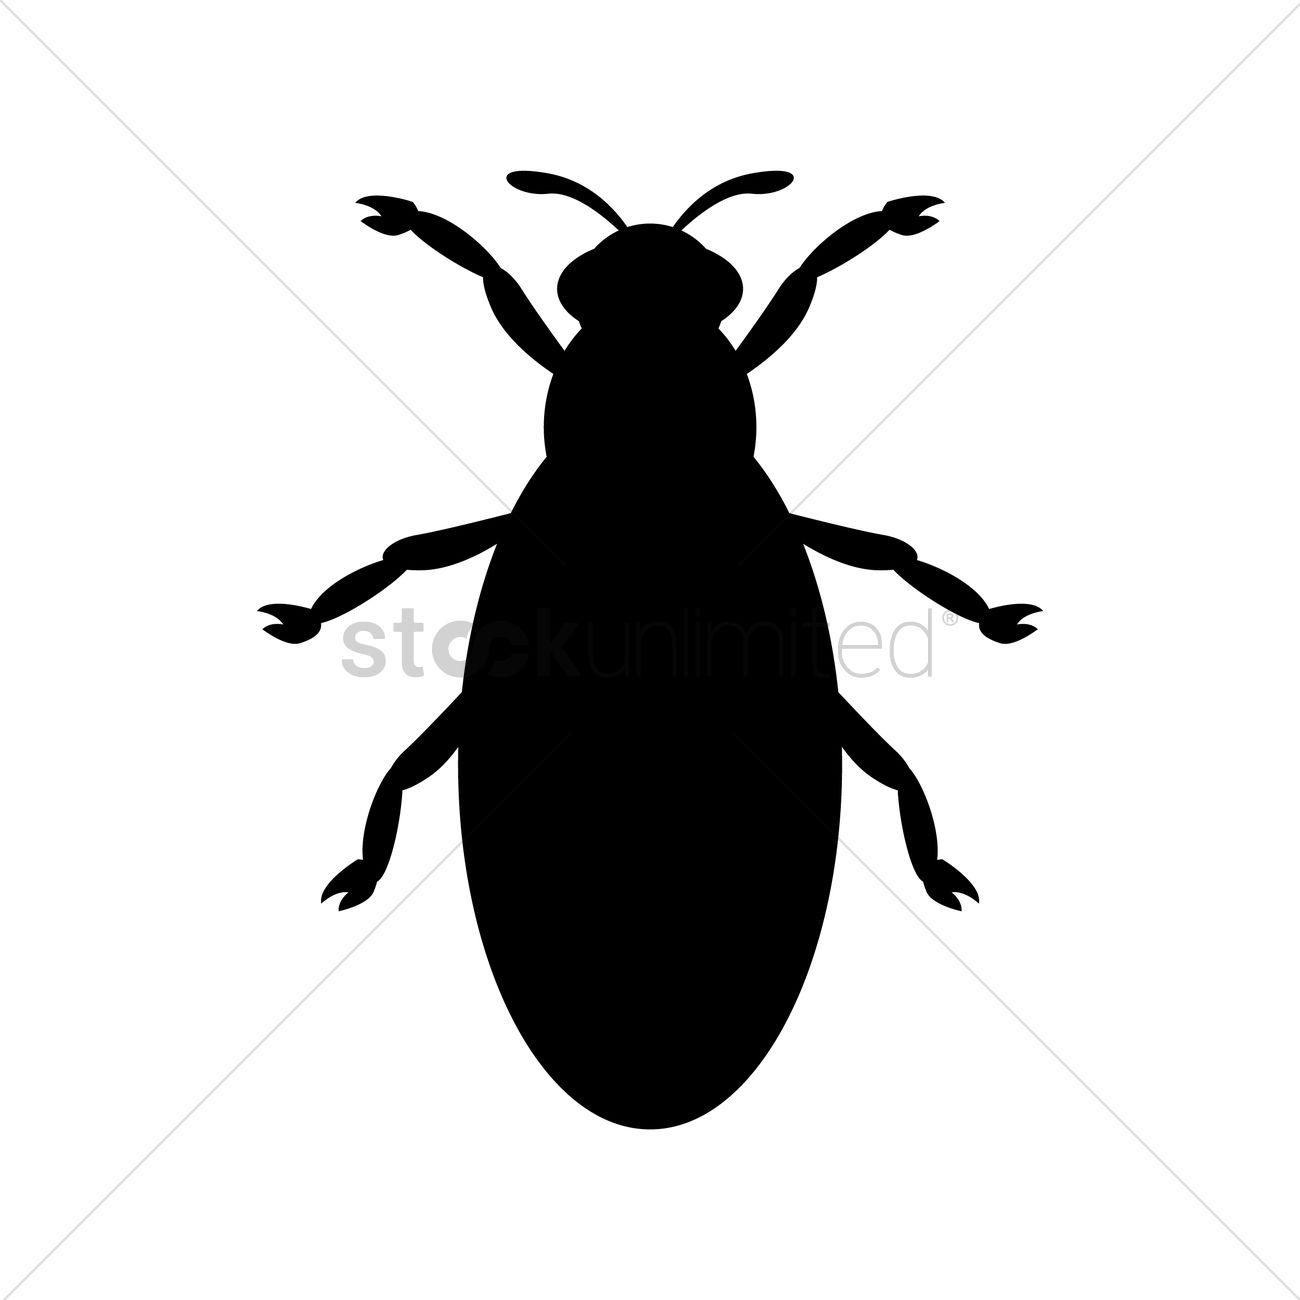 1300x1300 Bug Silhouette Vector Image